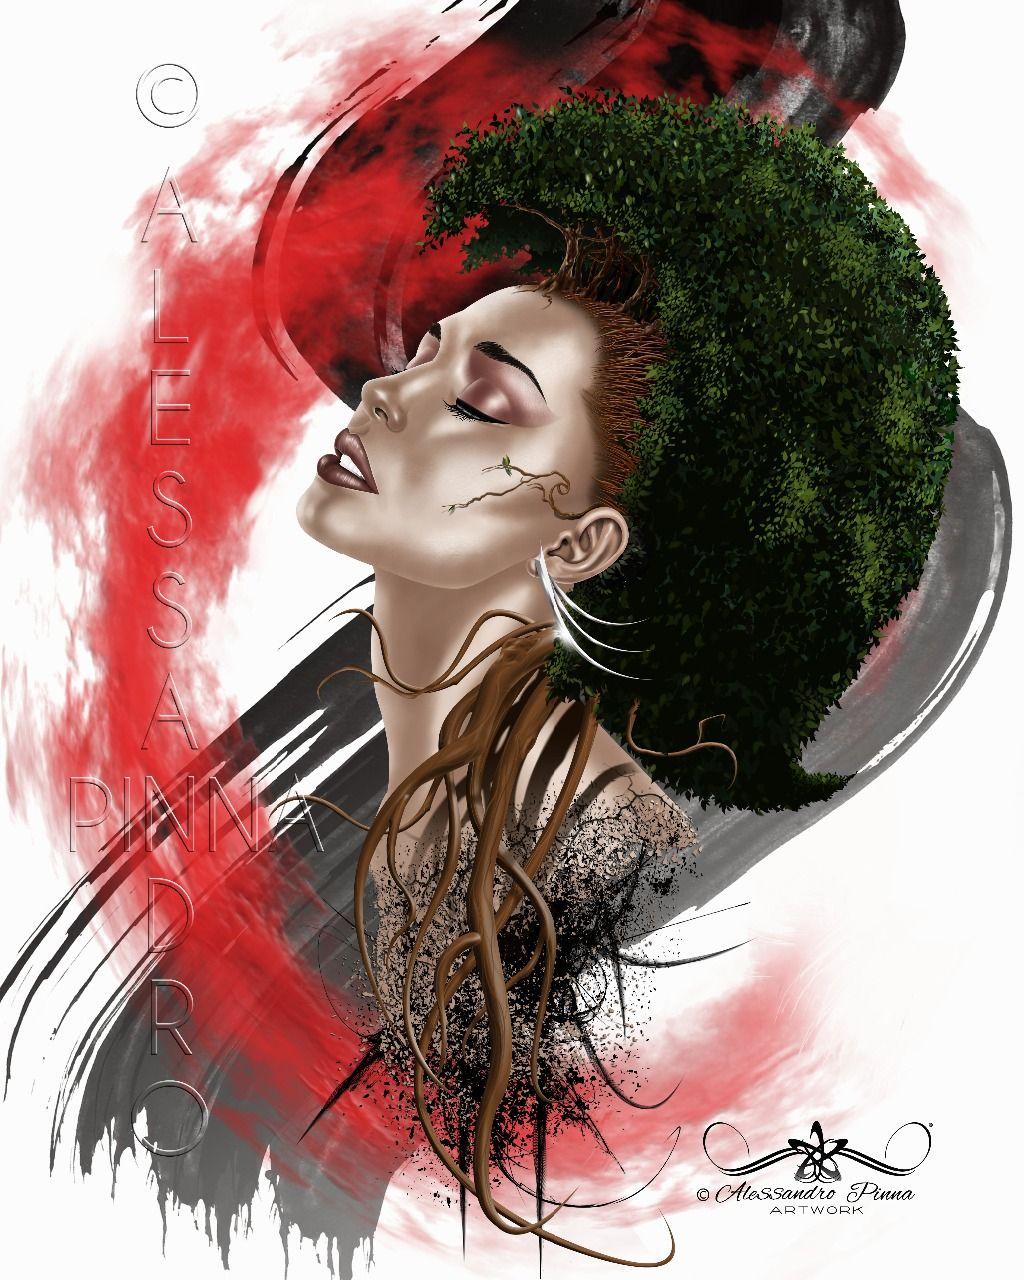 Mother nature 2.                                   Gallery art :: ALESSANDRO PINNA ARTWORK